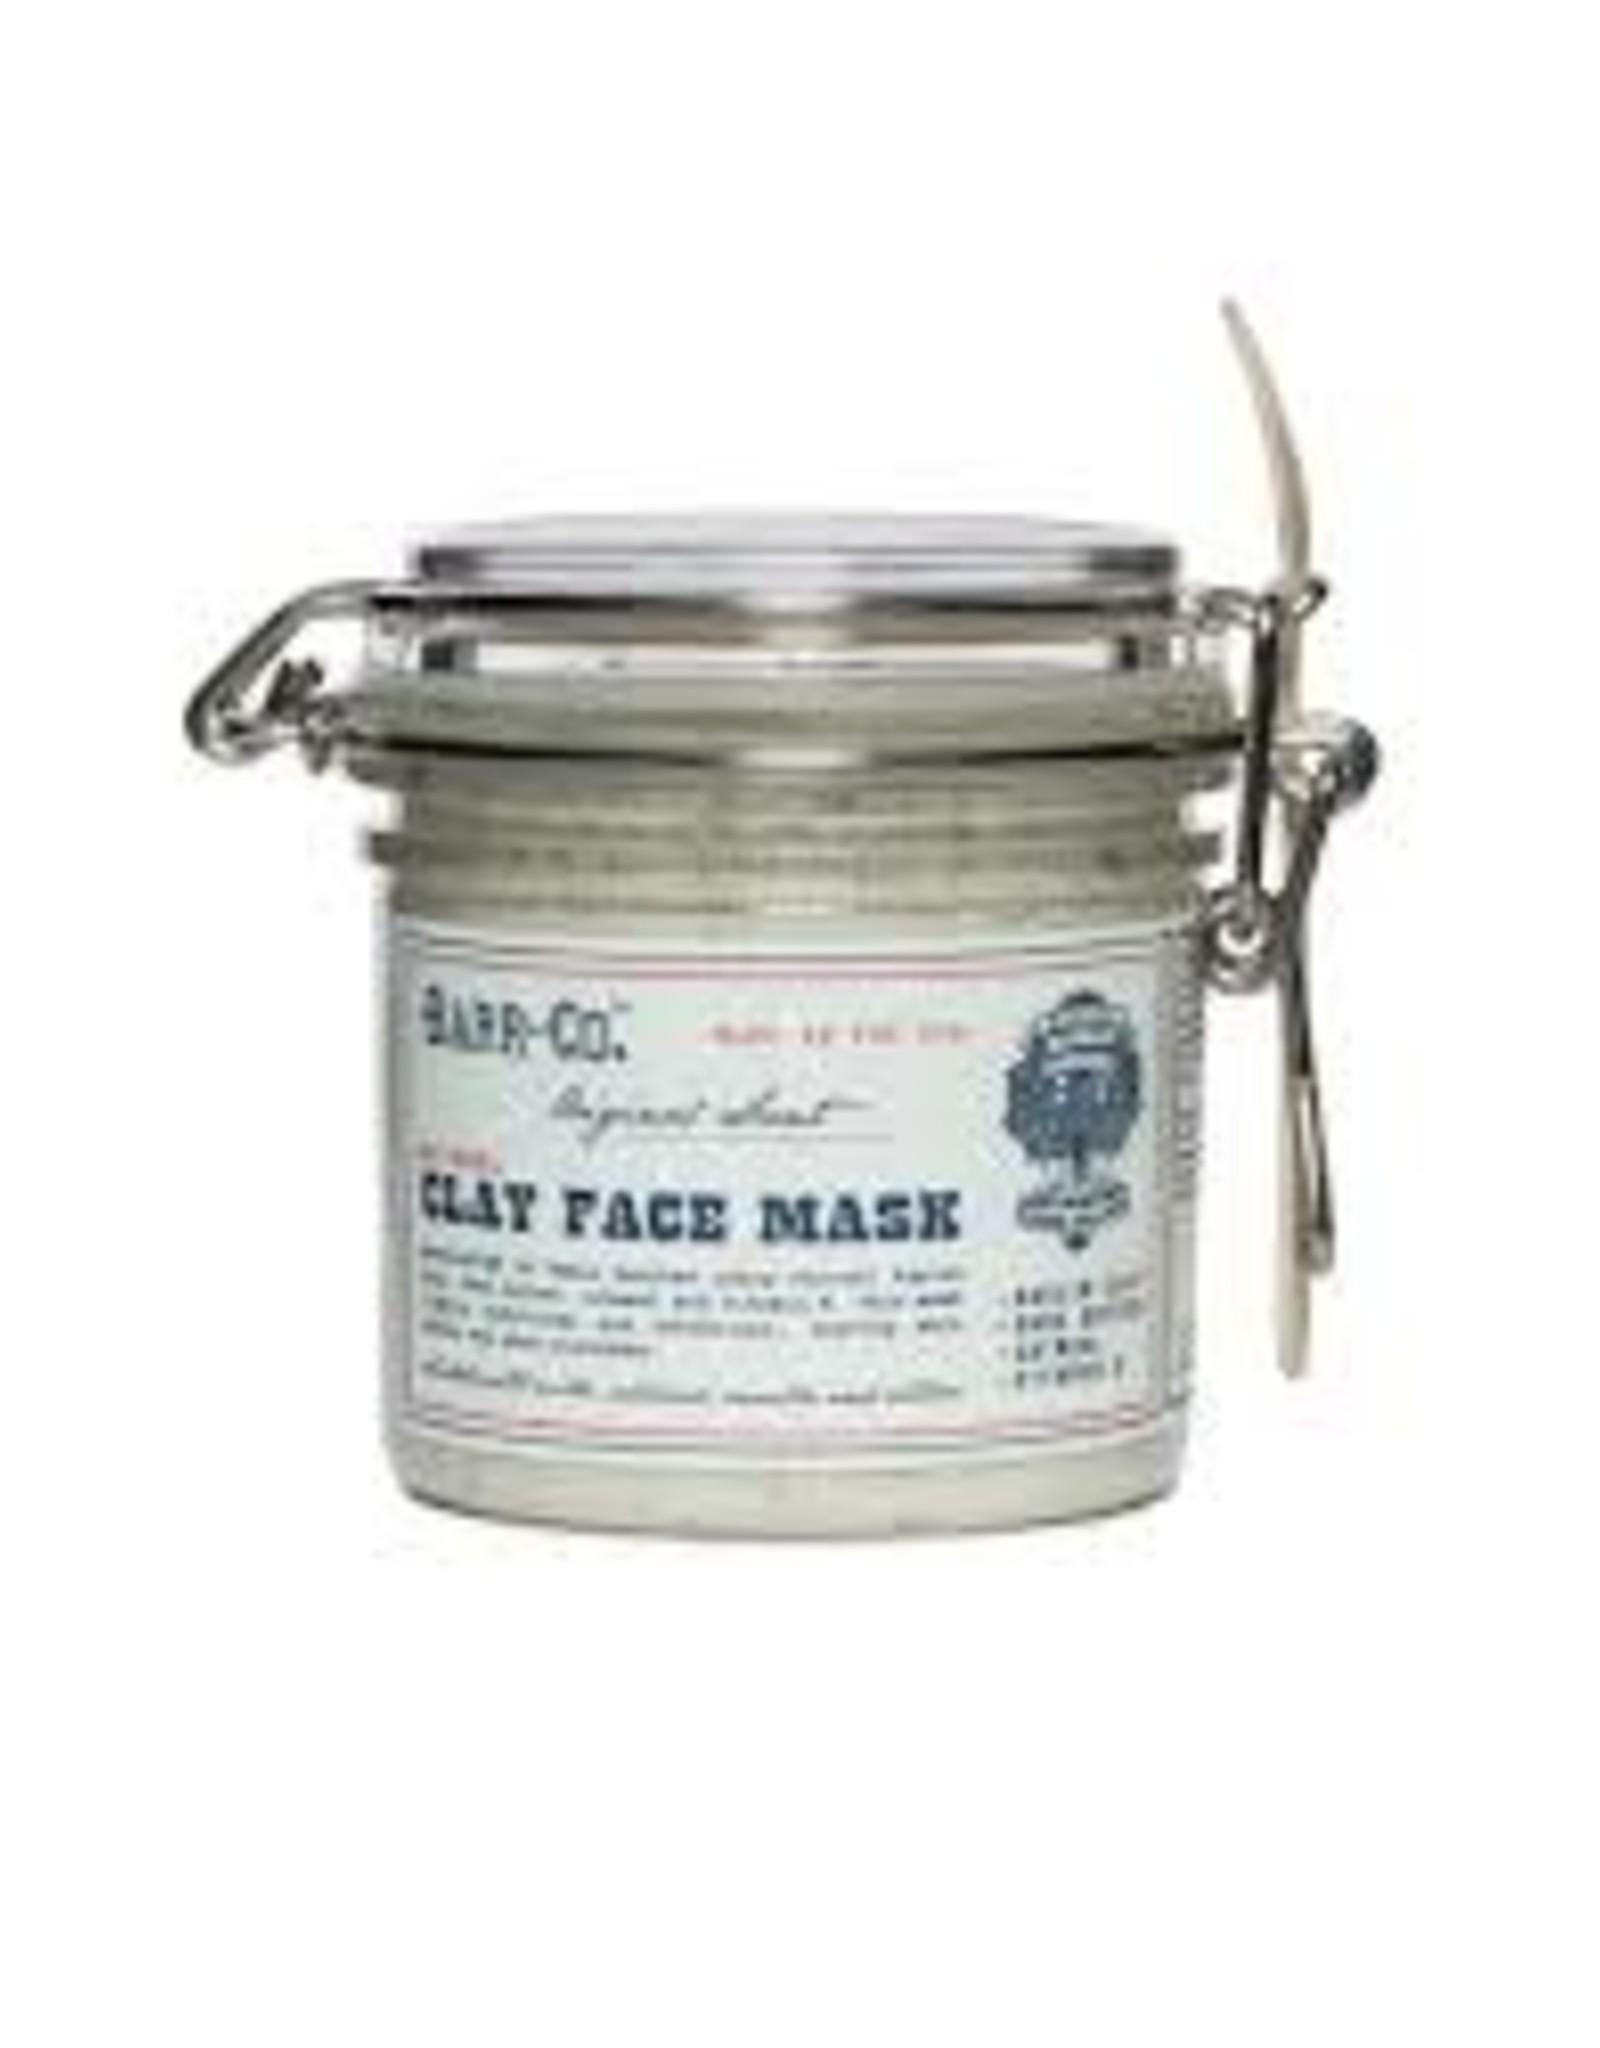 Barr-Co. Barr-Co. Clay Face Mask 6oz Original Scent